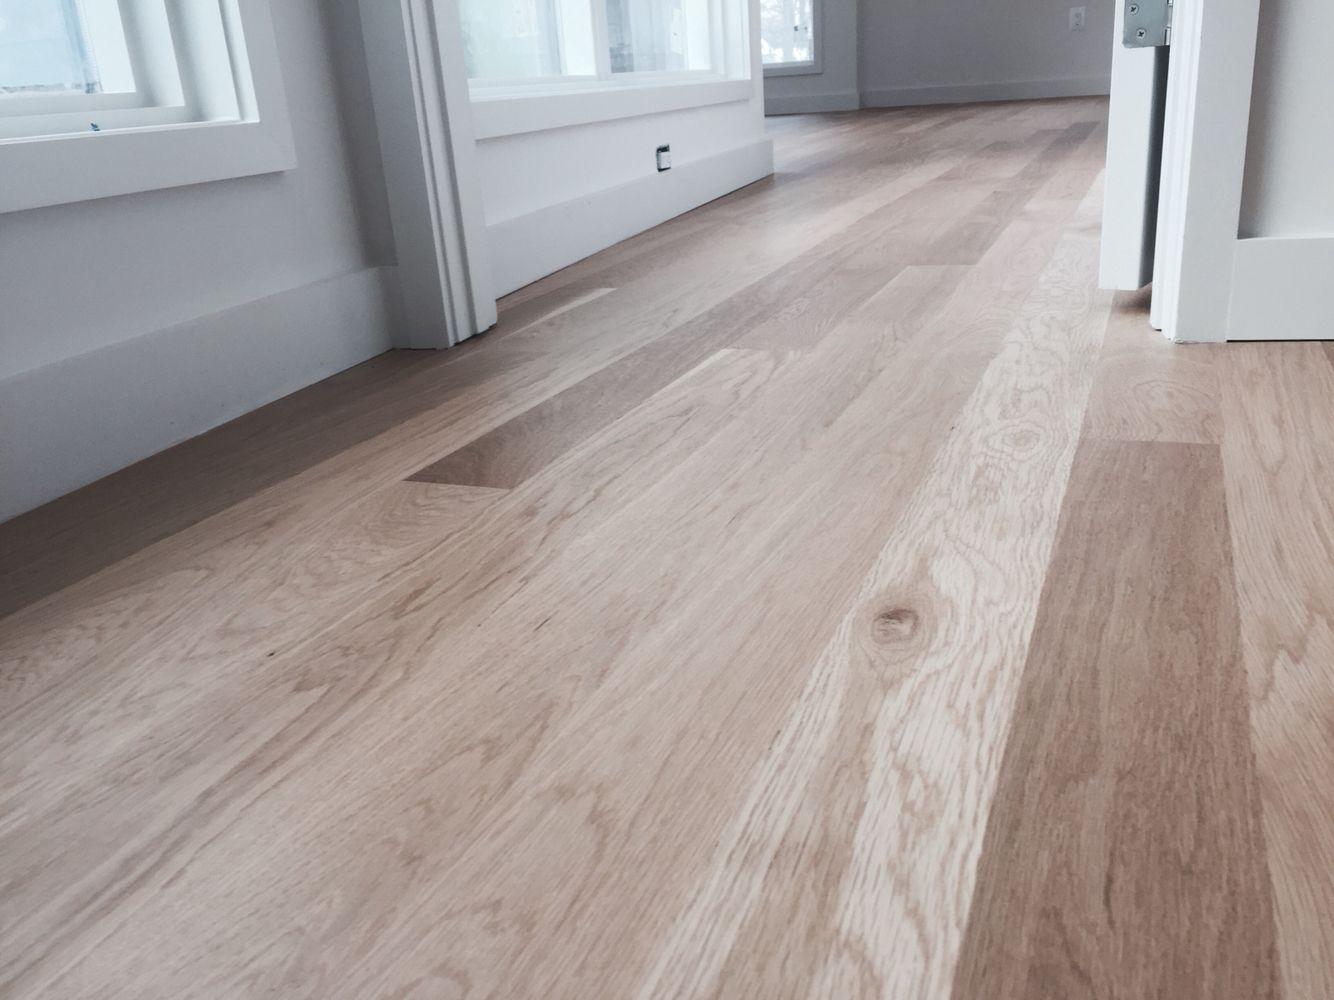 Bona Naturale Floor Finish Reviews Floor Matttroy